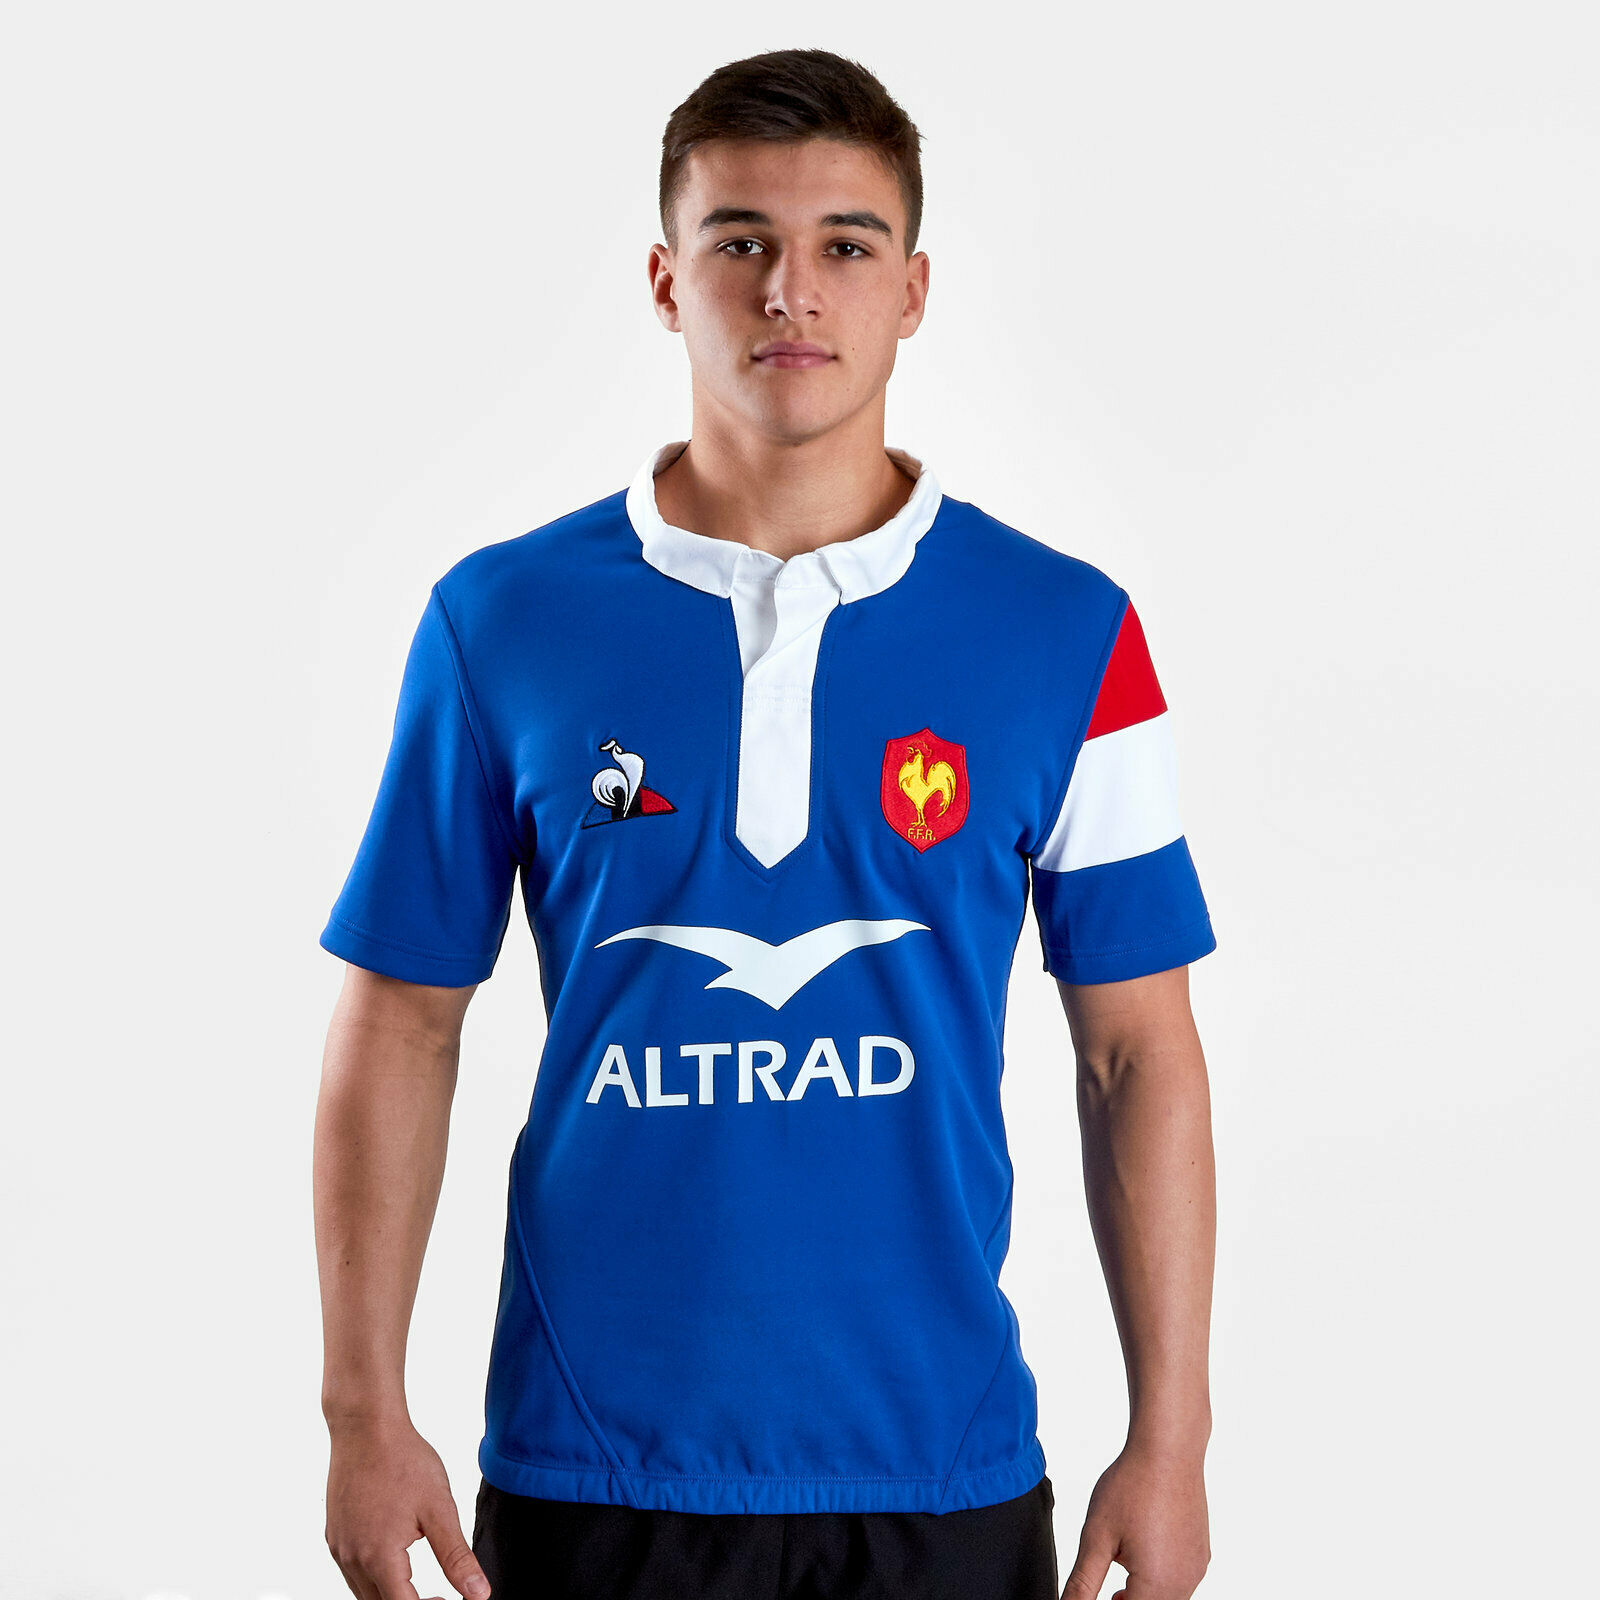 Le Coq Sportif Da Uomo 2018 19 Francia Casa Manica Corta Rugby Shirt Tee Top Blu